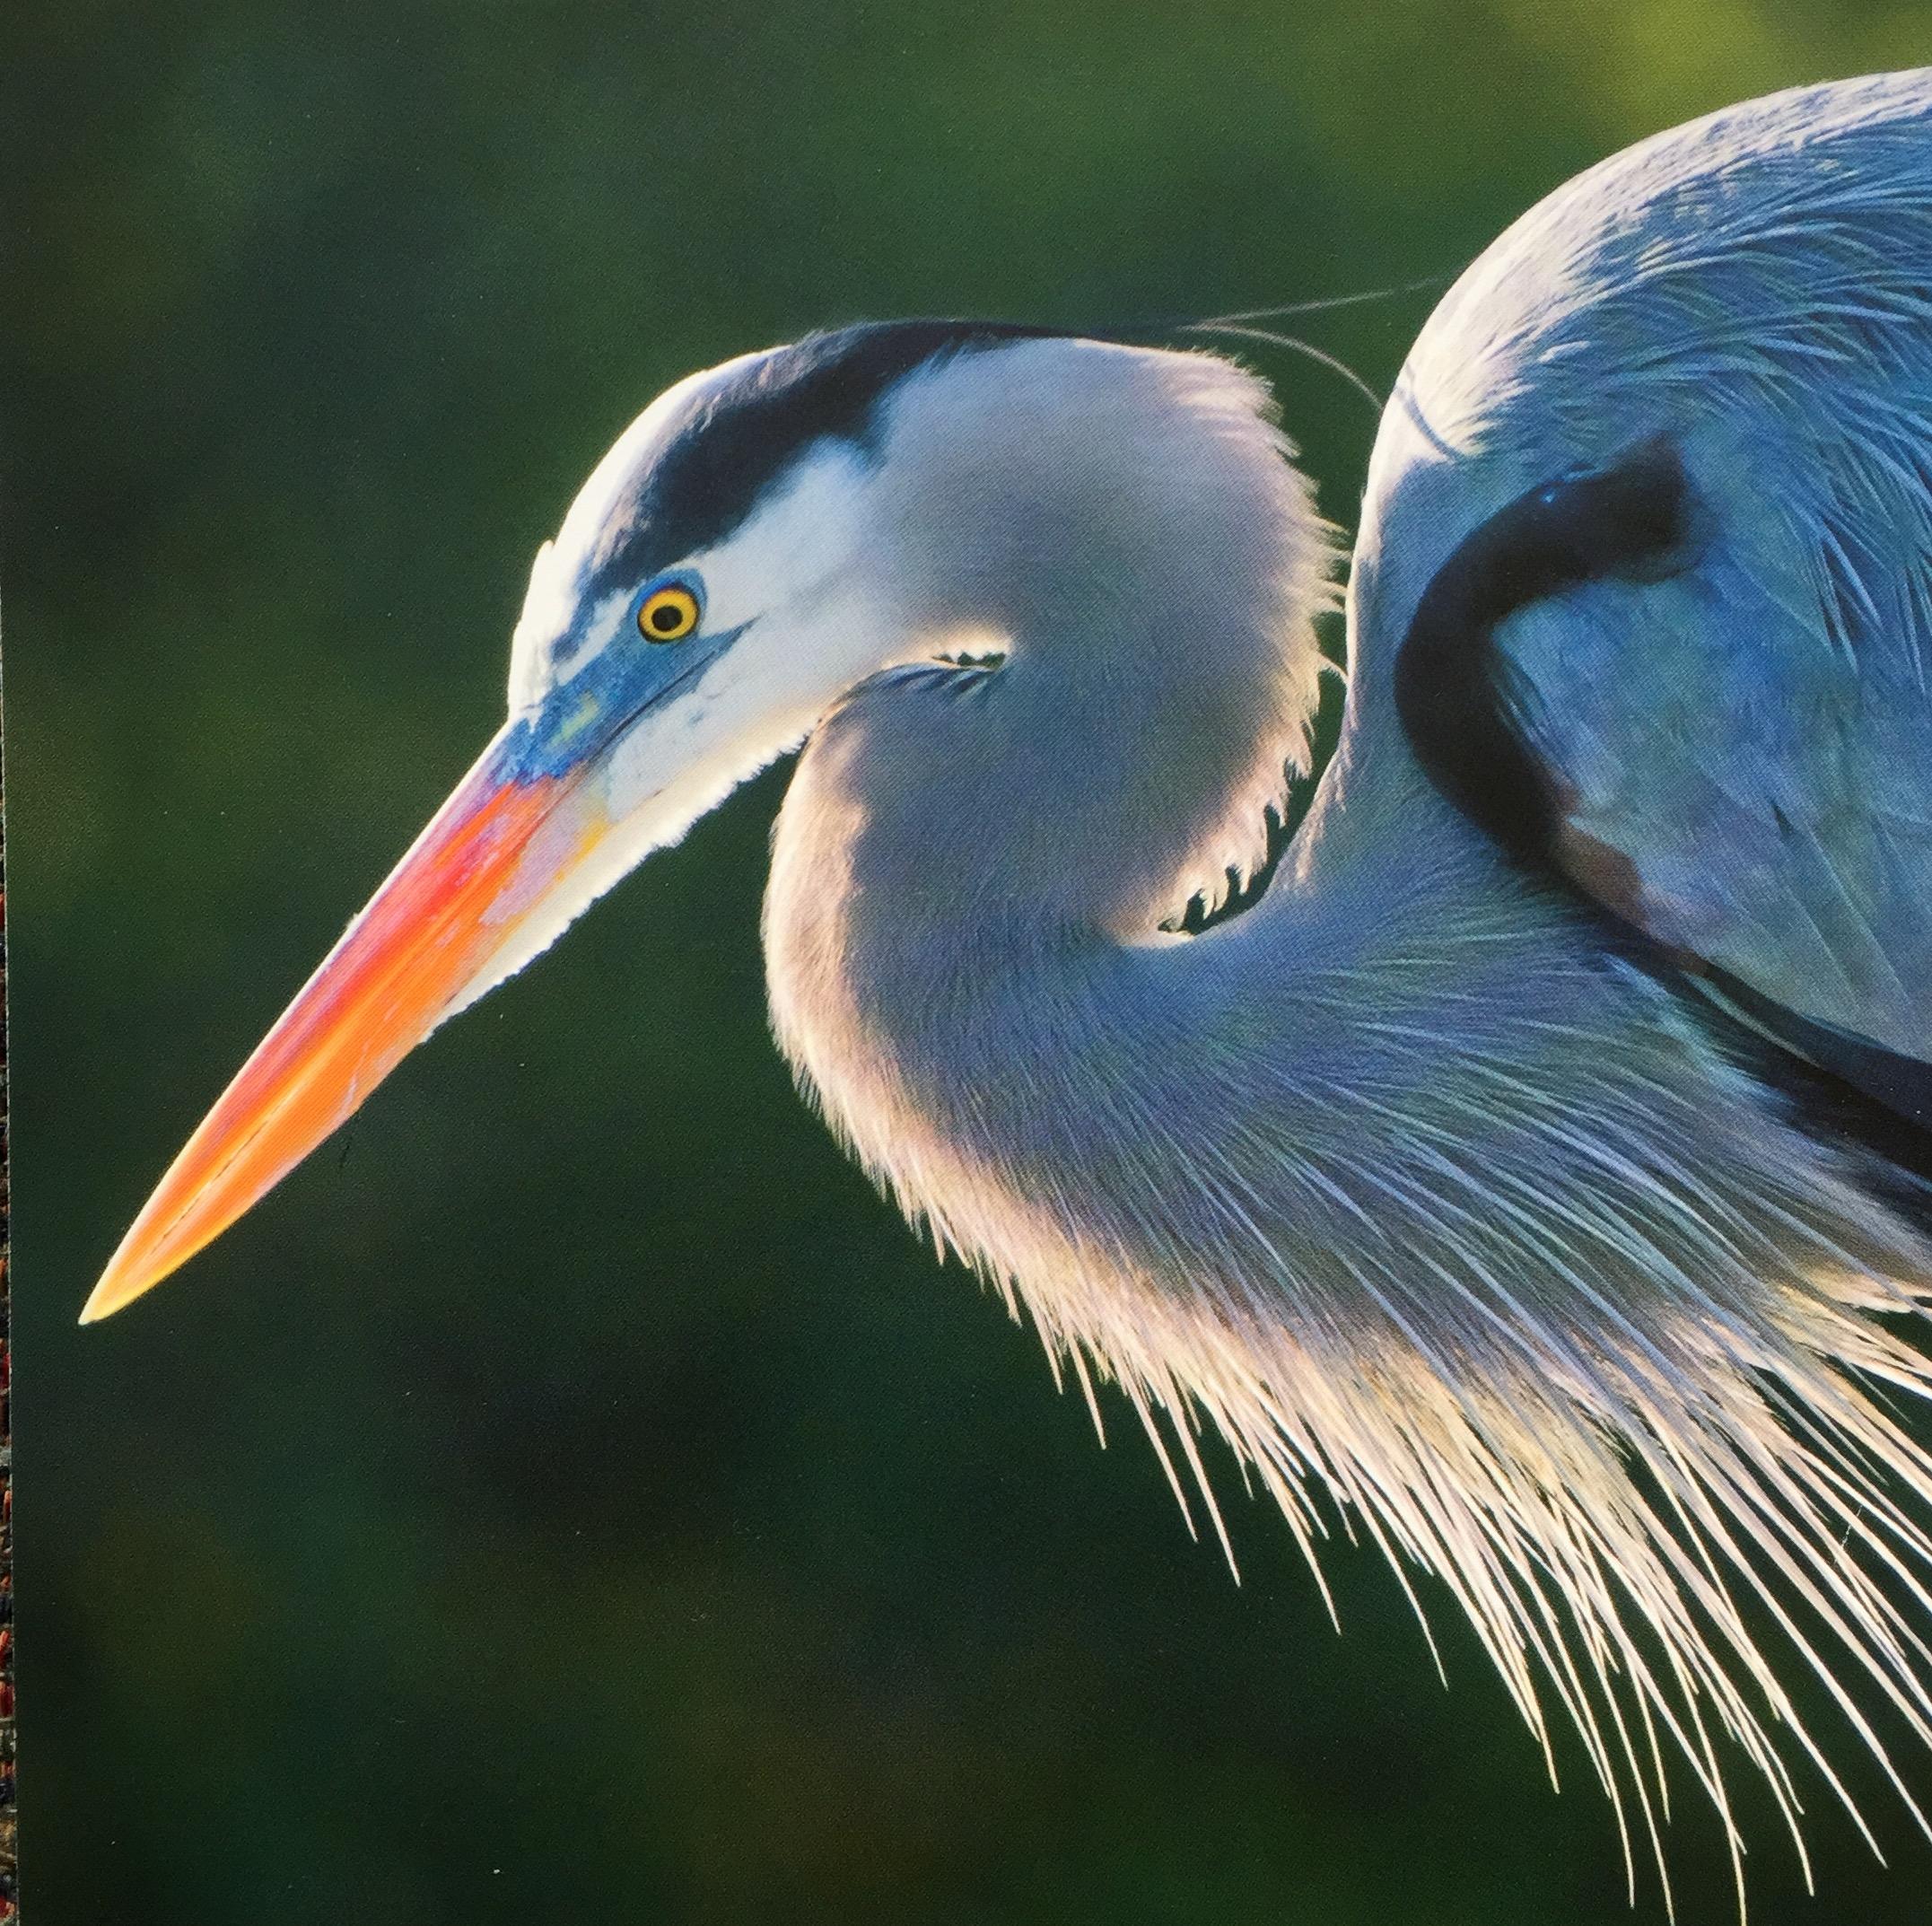 Shorebirds, Seabirds & Little Brown Birds with Mark Elliott